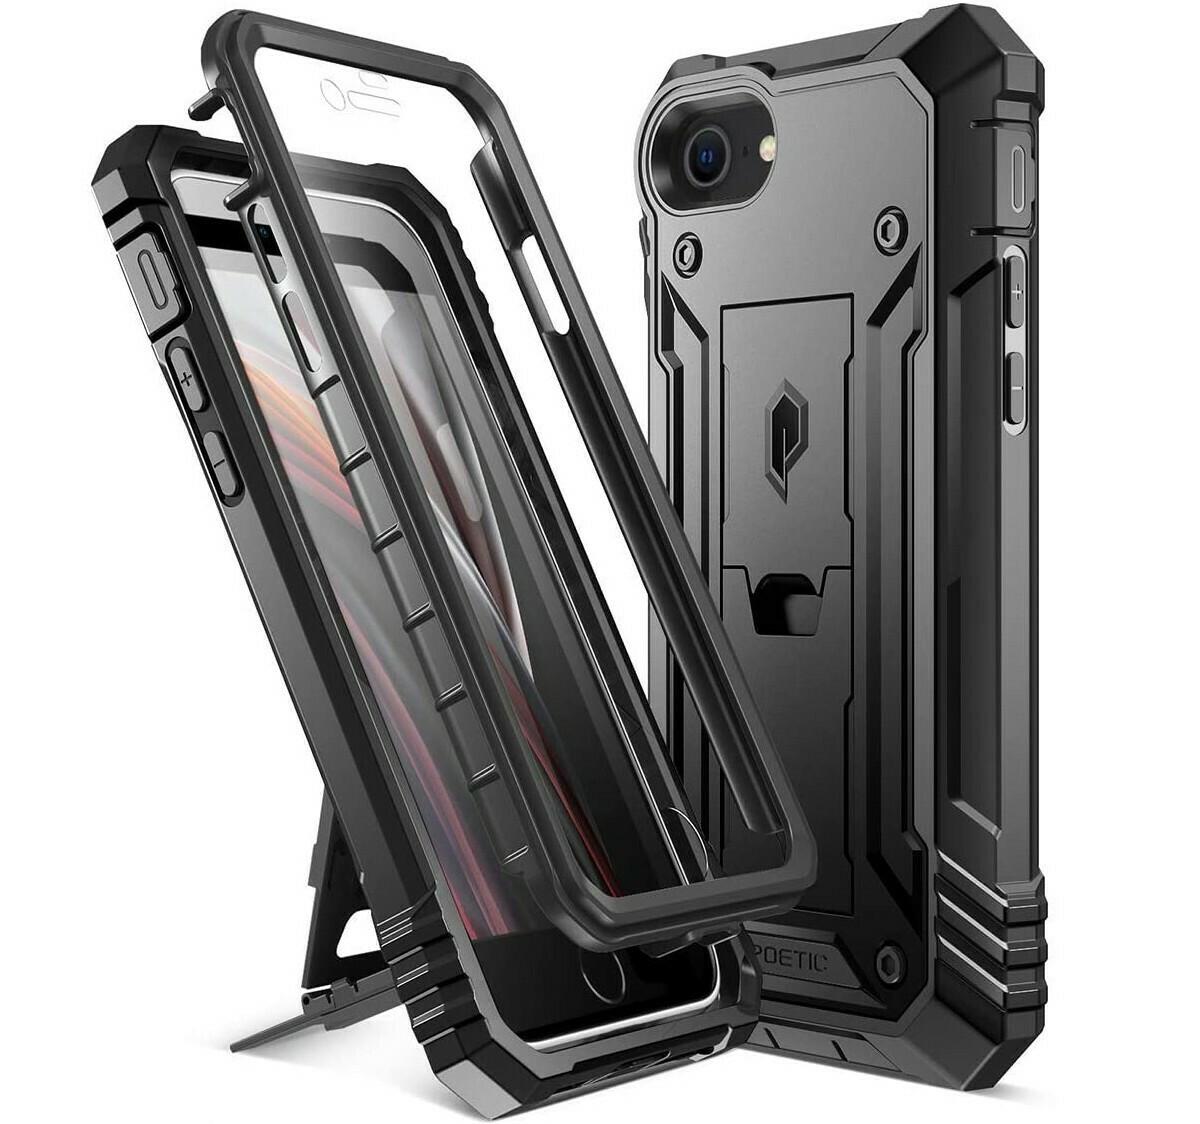 Case Iphone 7 c/ Parante de 3 partes c/ 2 Marcos s/con Mica Incorporada Negro